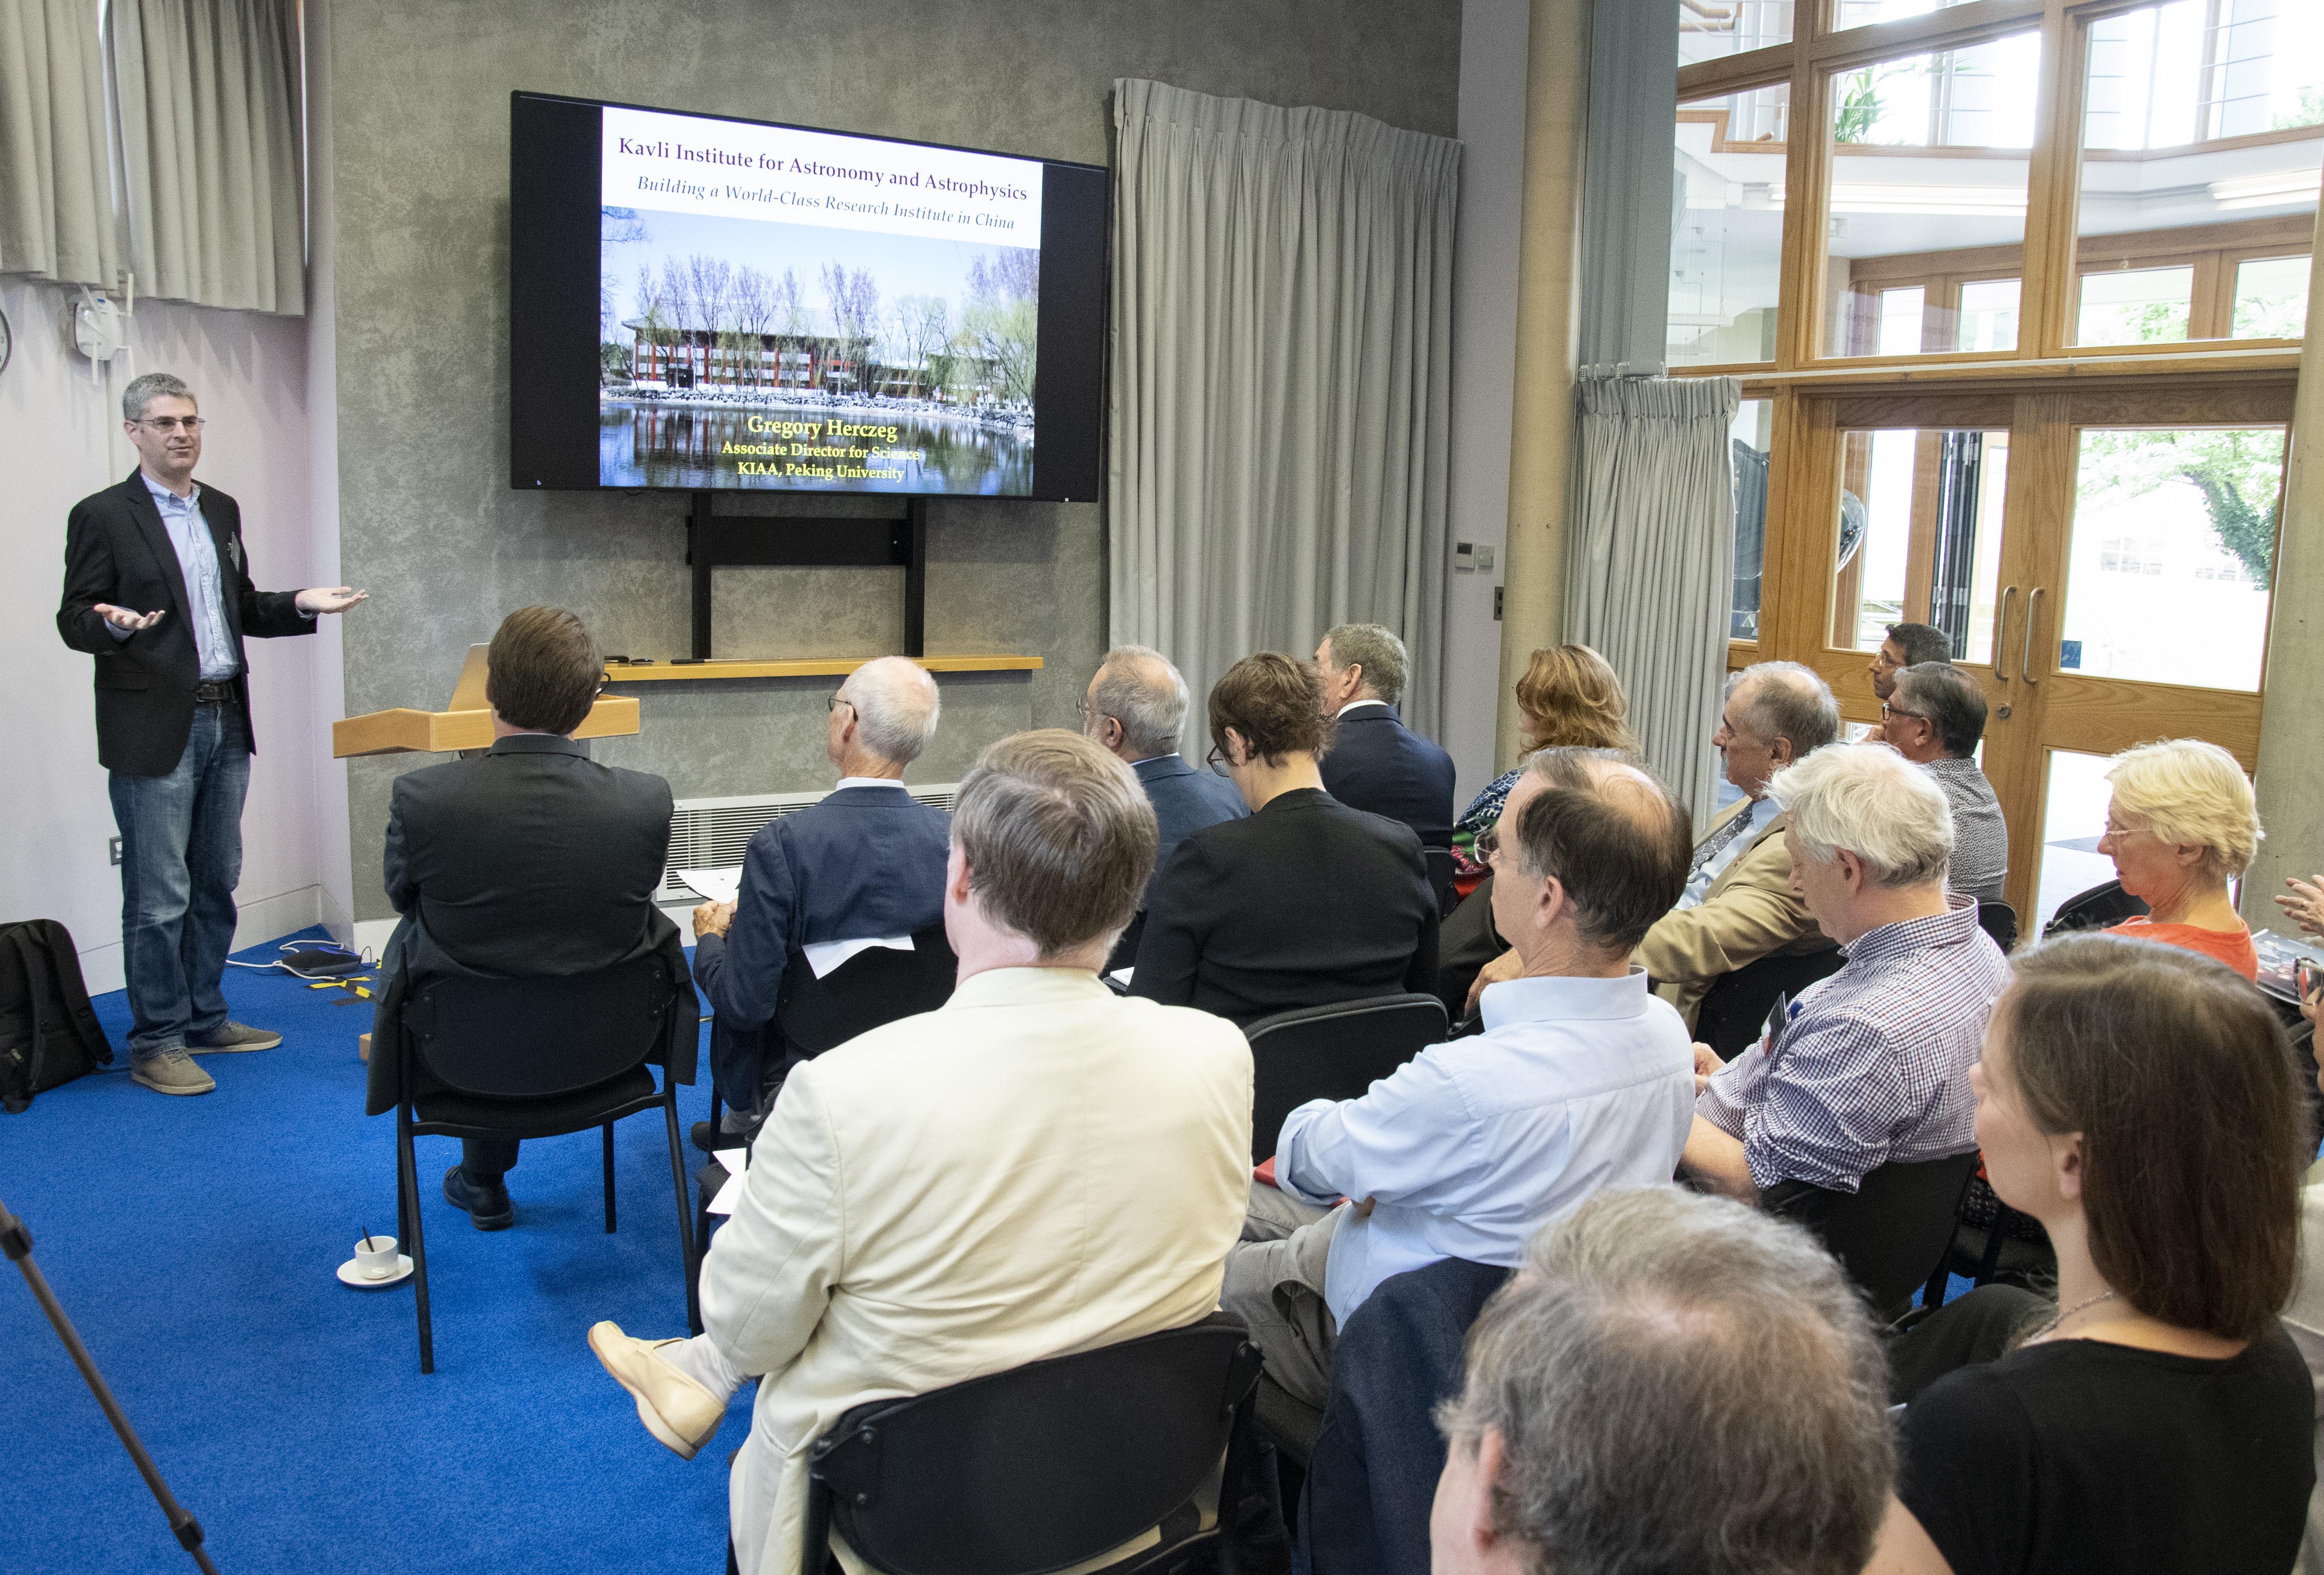 Morning presentations: Gregory Herczeg